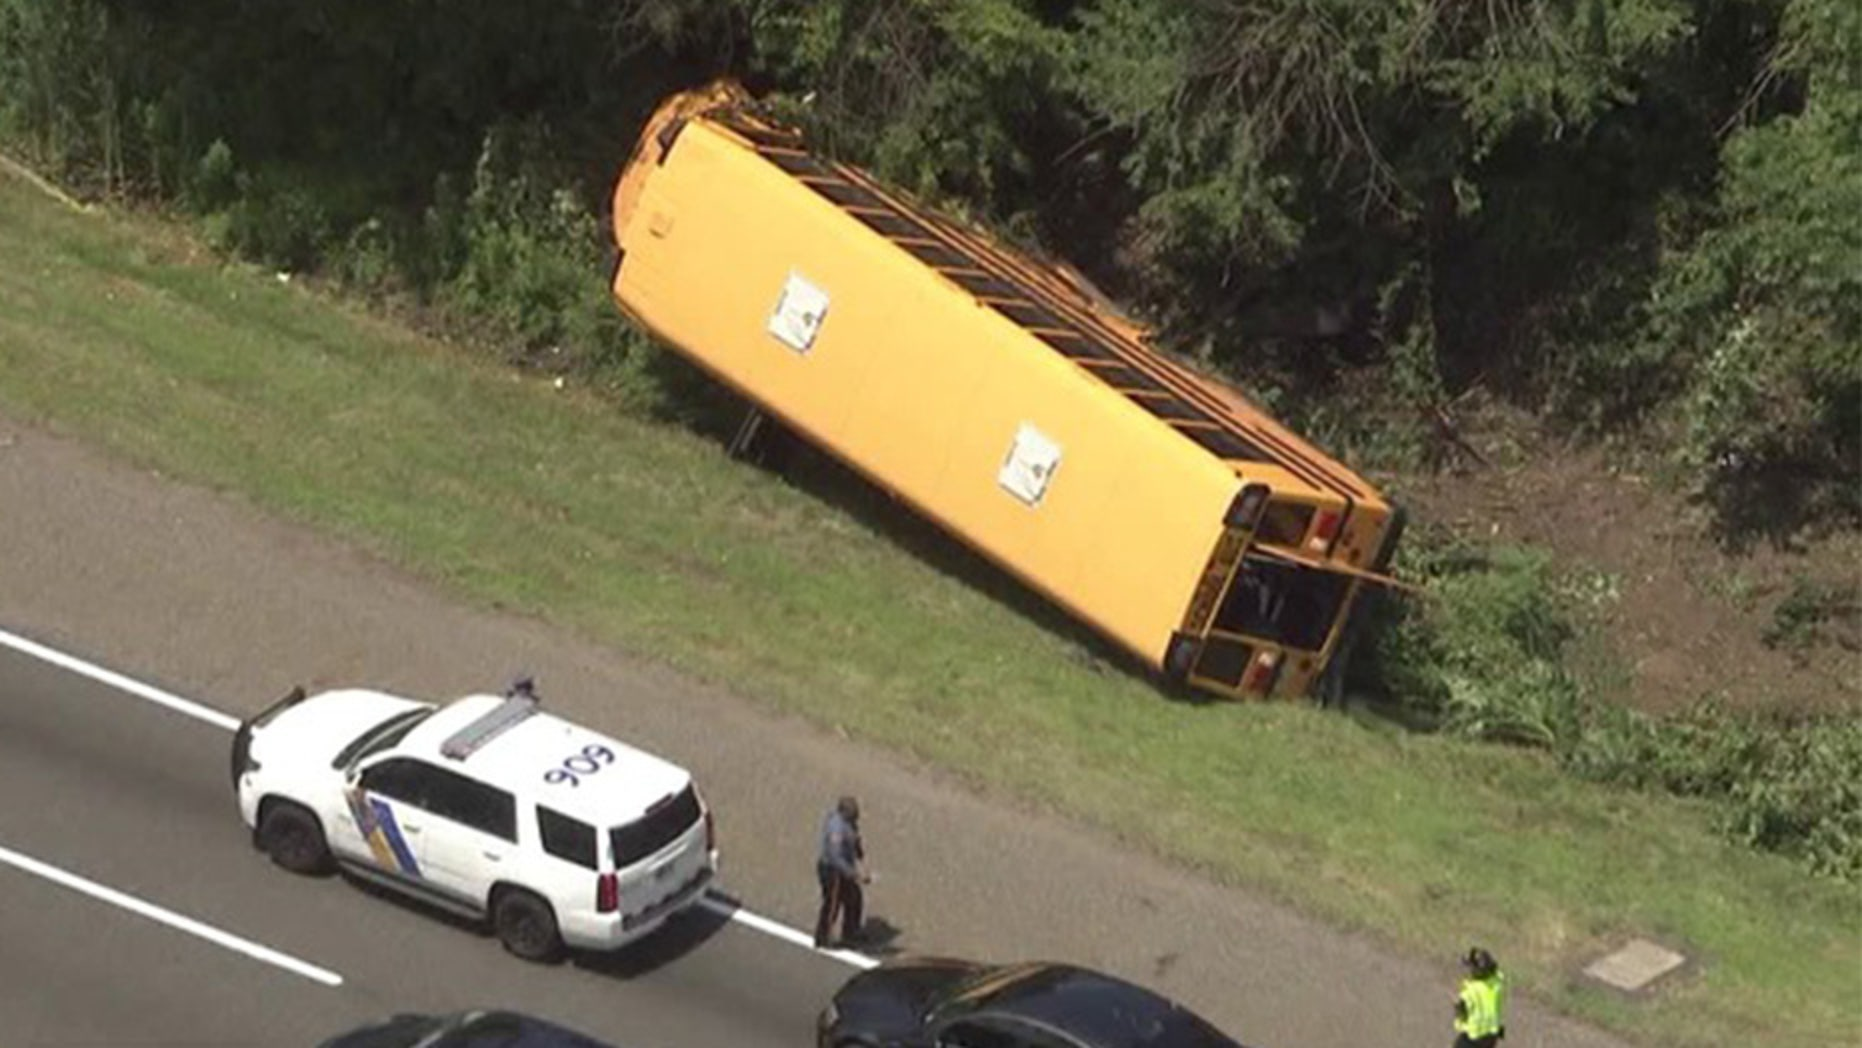 A school bus flipped on its side in Cherry Hill, N.J.